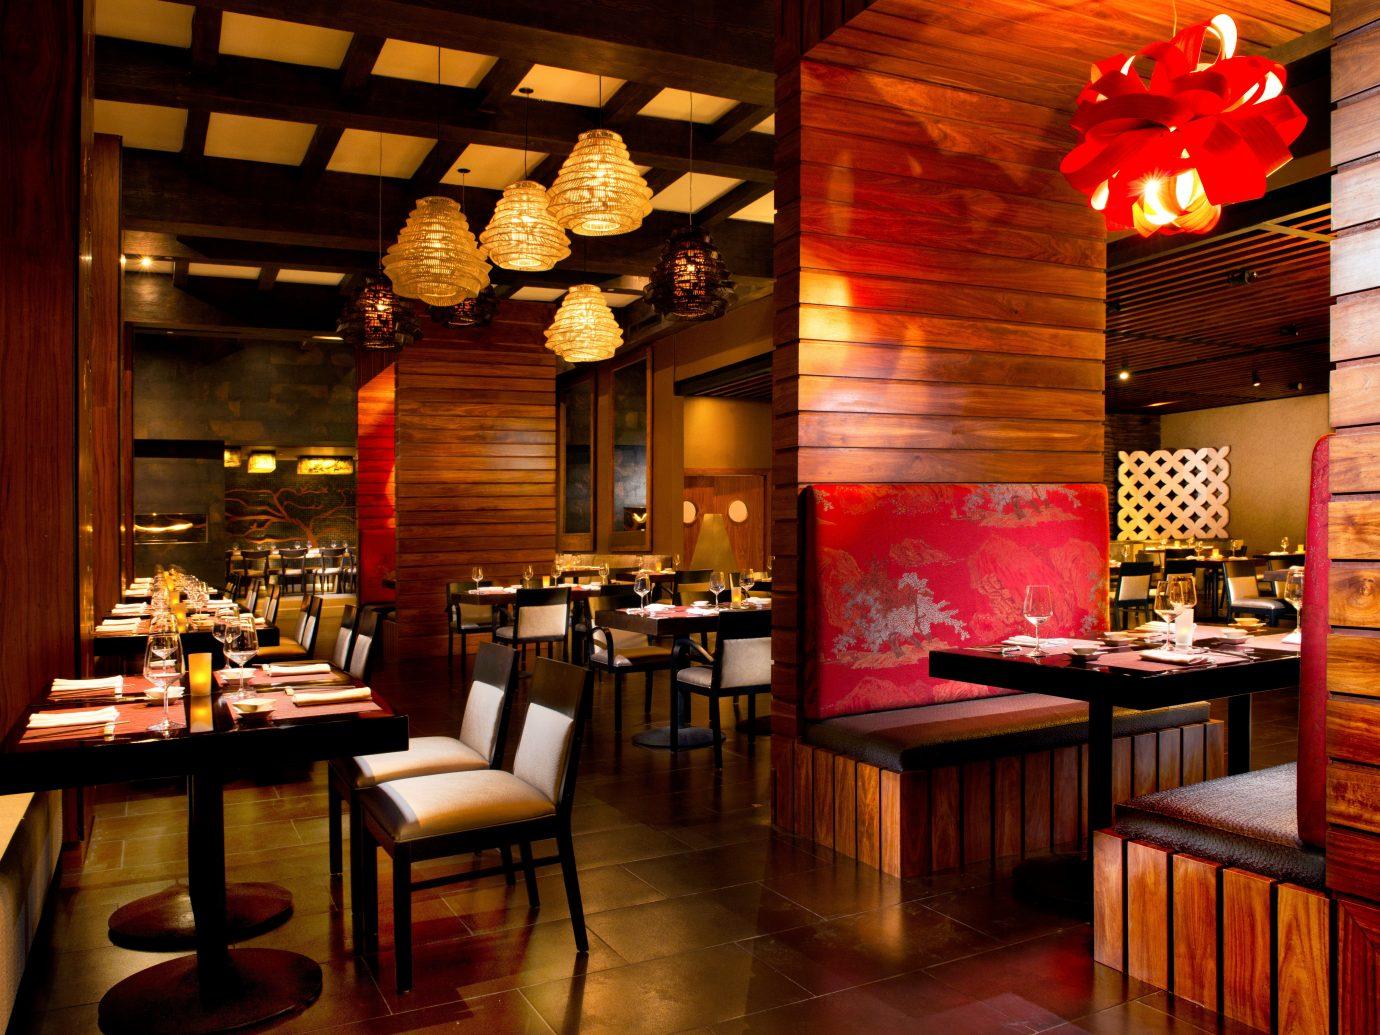 Adult-only Dining Drink Eat Elegant Hotels Luxury Romance Scenic views indoor floor table room restaurant Bar interior design café furniture